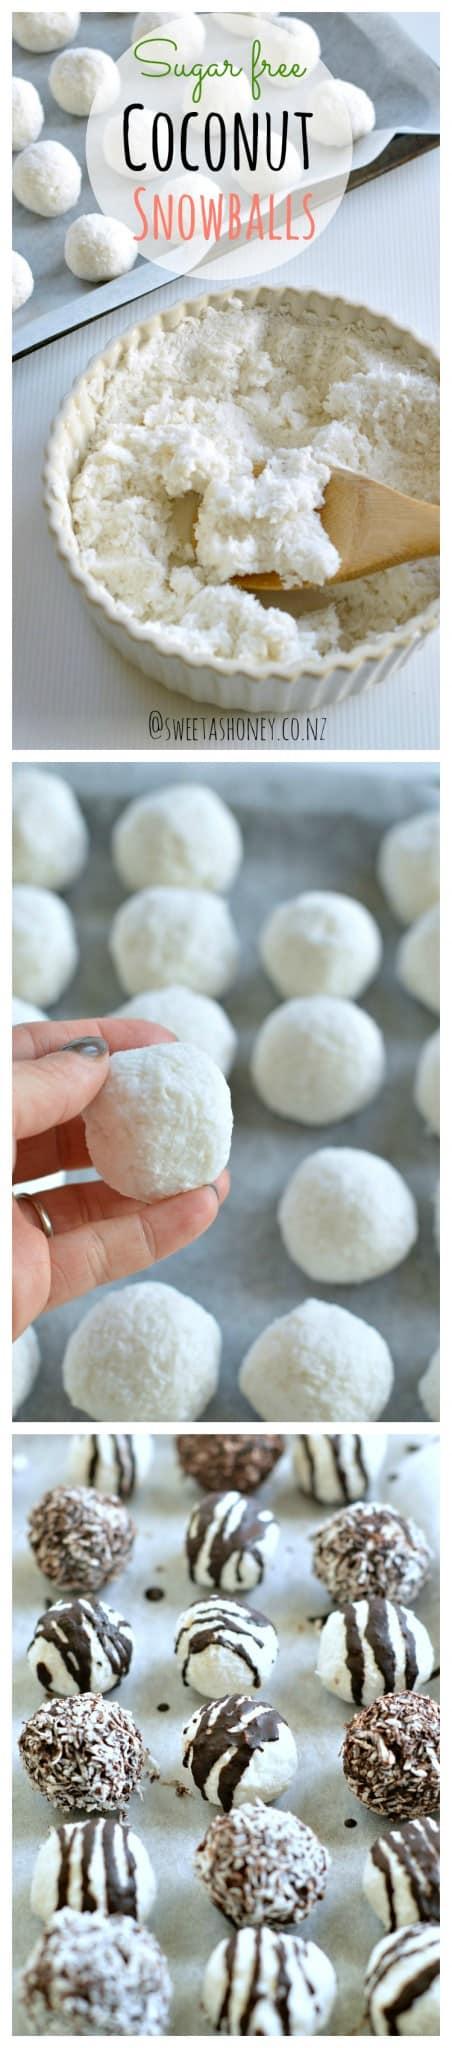 Coconut Balls | Healthy Christmas Truffles - Sweetashoney